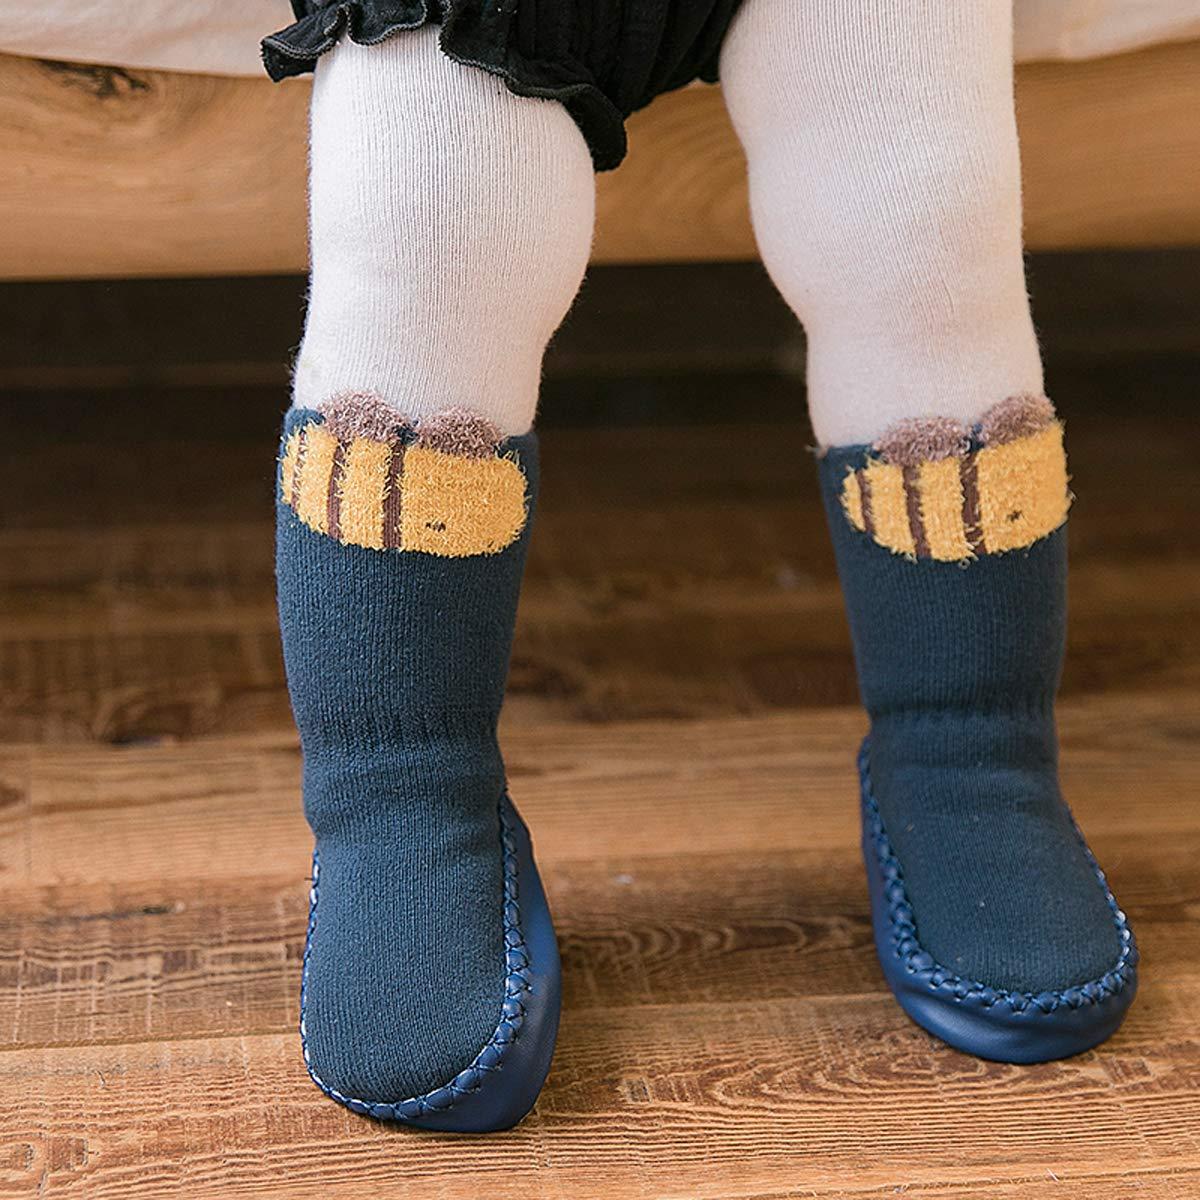 Skola Cartoon Cute Thick Winter Warm Baby Toddler Anti Slip Skid Grip Floor Socks Slipper Cotton Prewalker